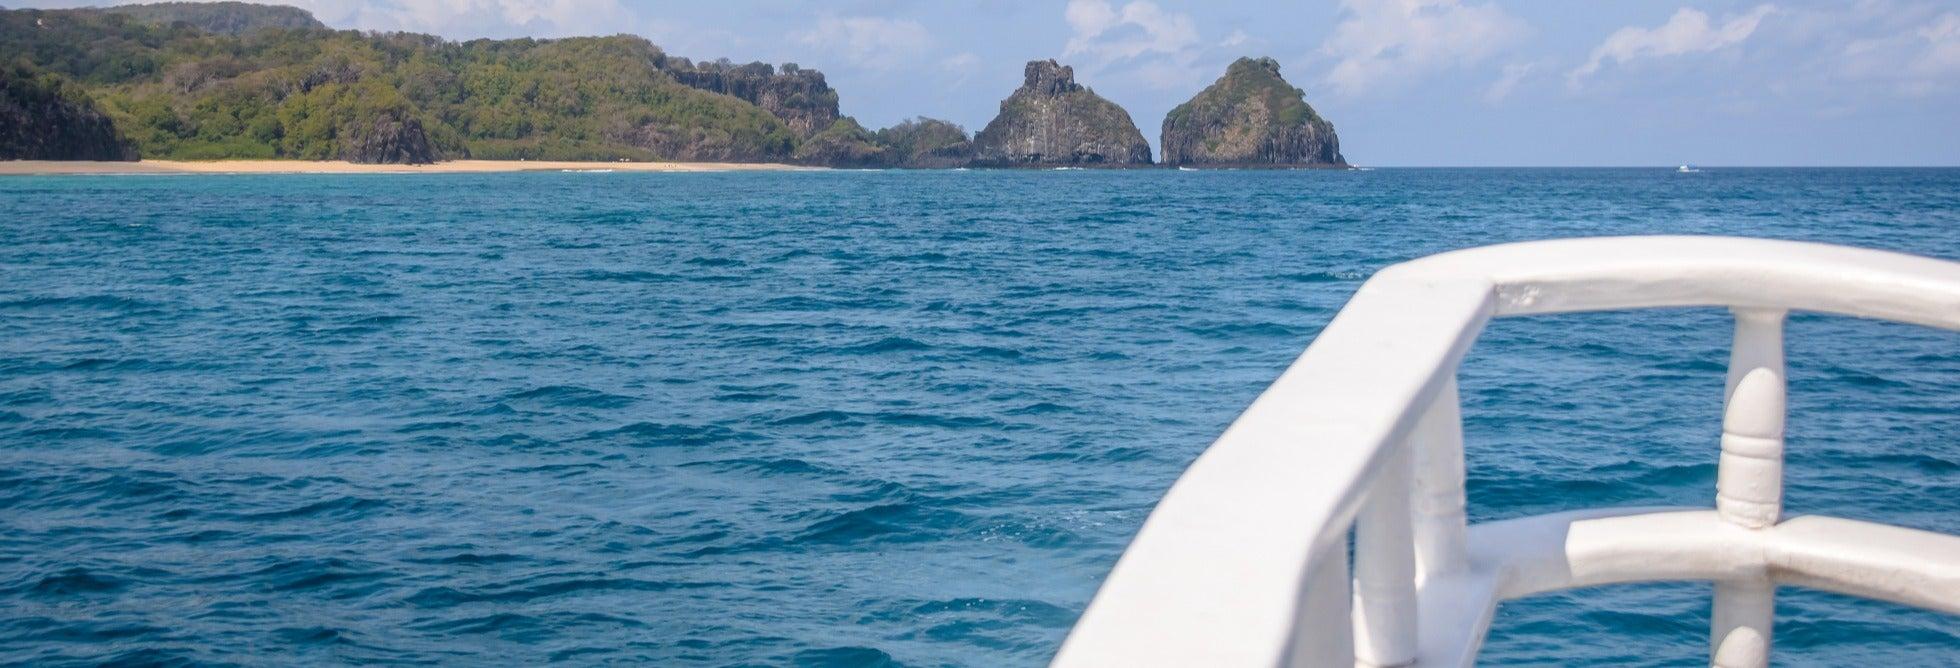 Paseo en barco por el Morro Dois Irmãos